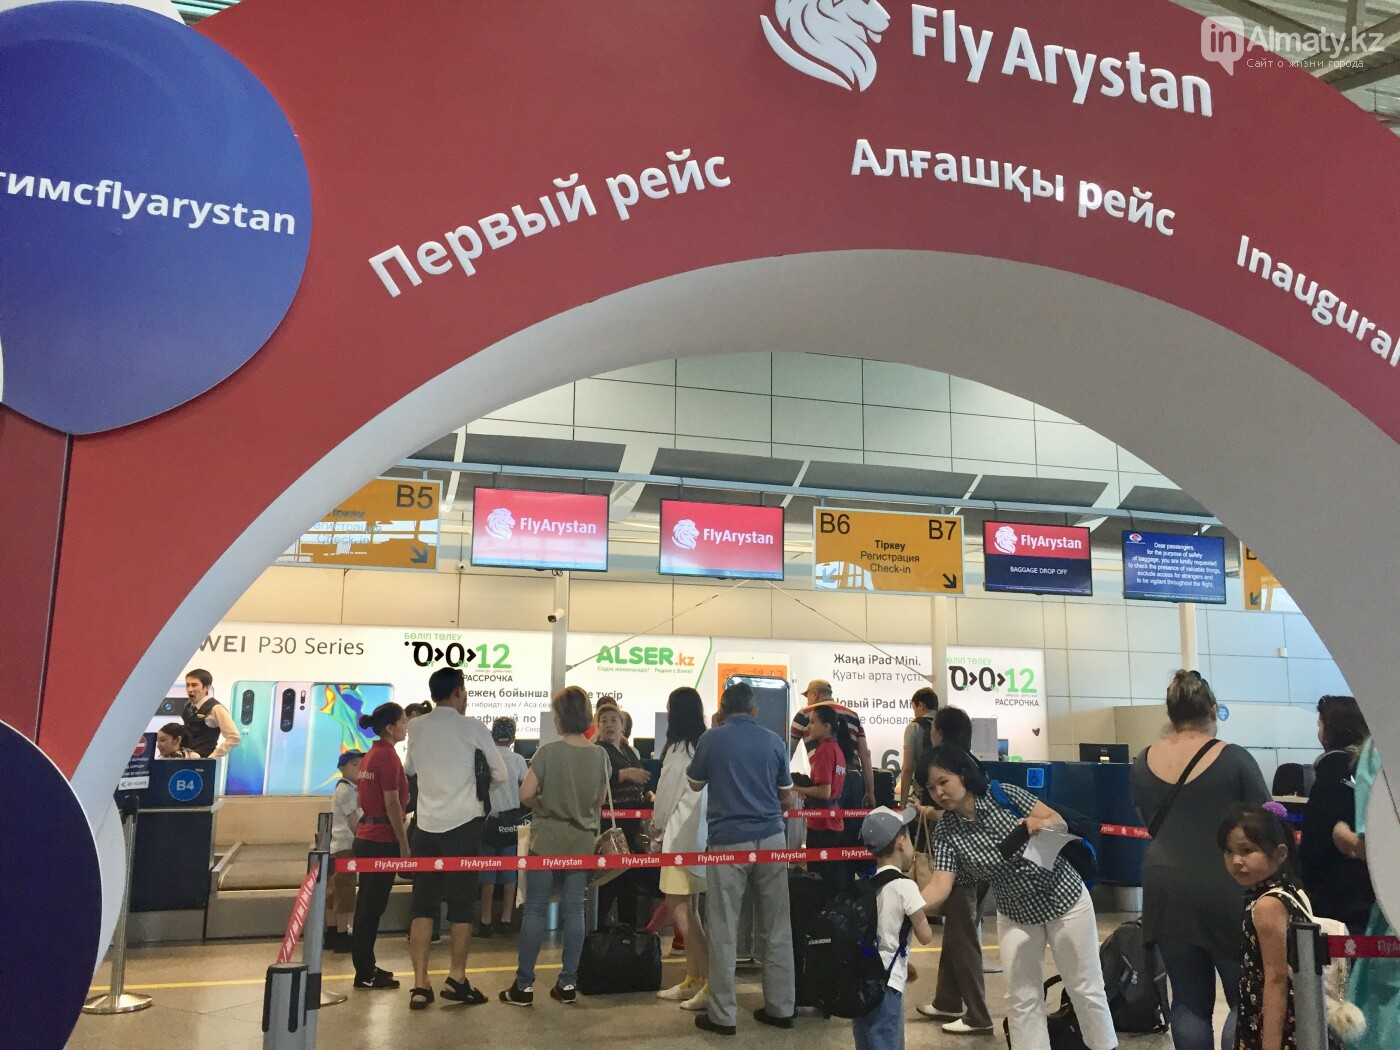 Как провезти багаж лоукостером FlyArystan, фото-1